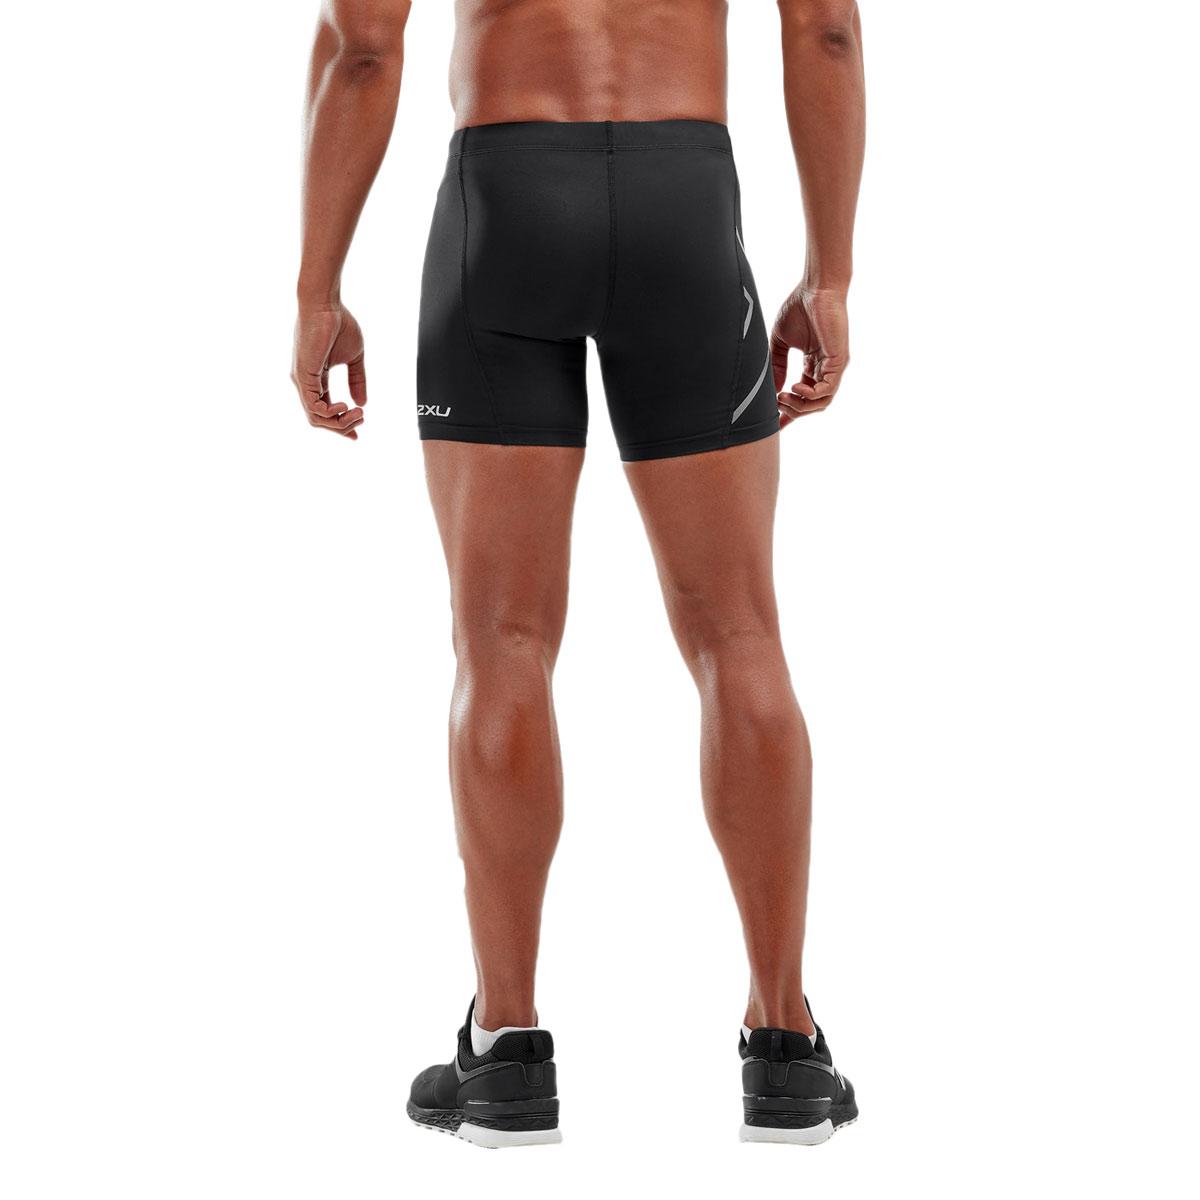 Image of 2XU Core Compression 1/2 Shorts - black/silver